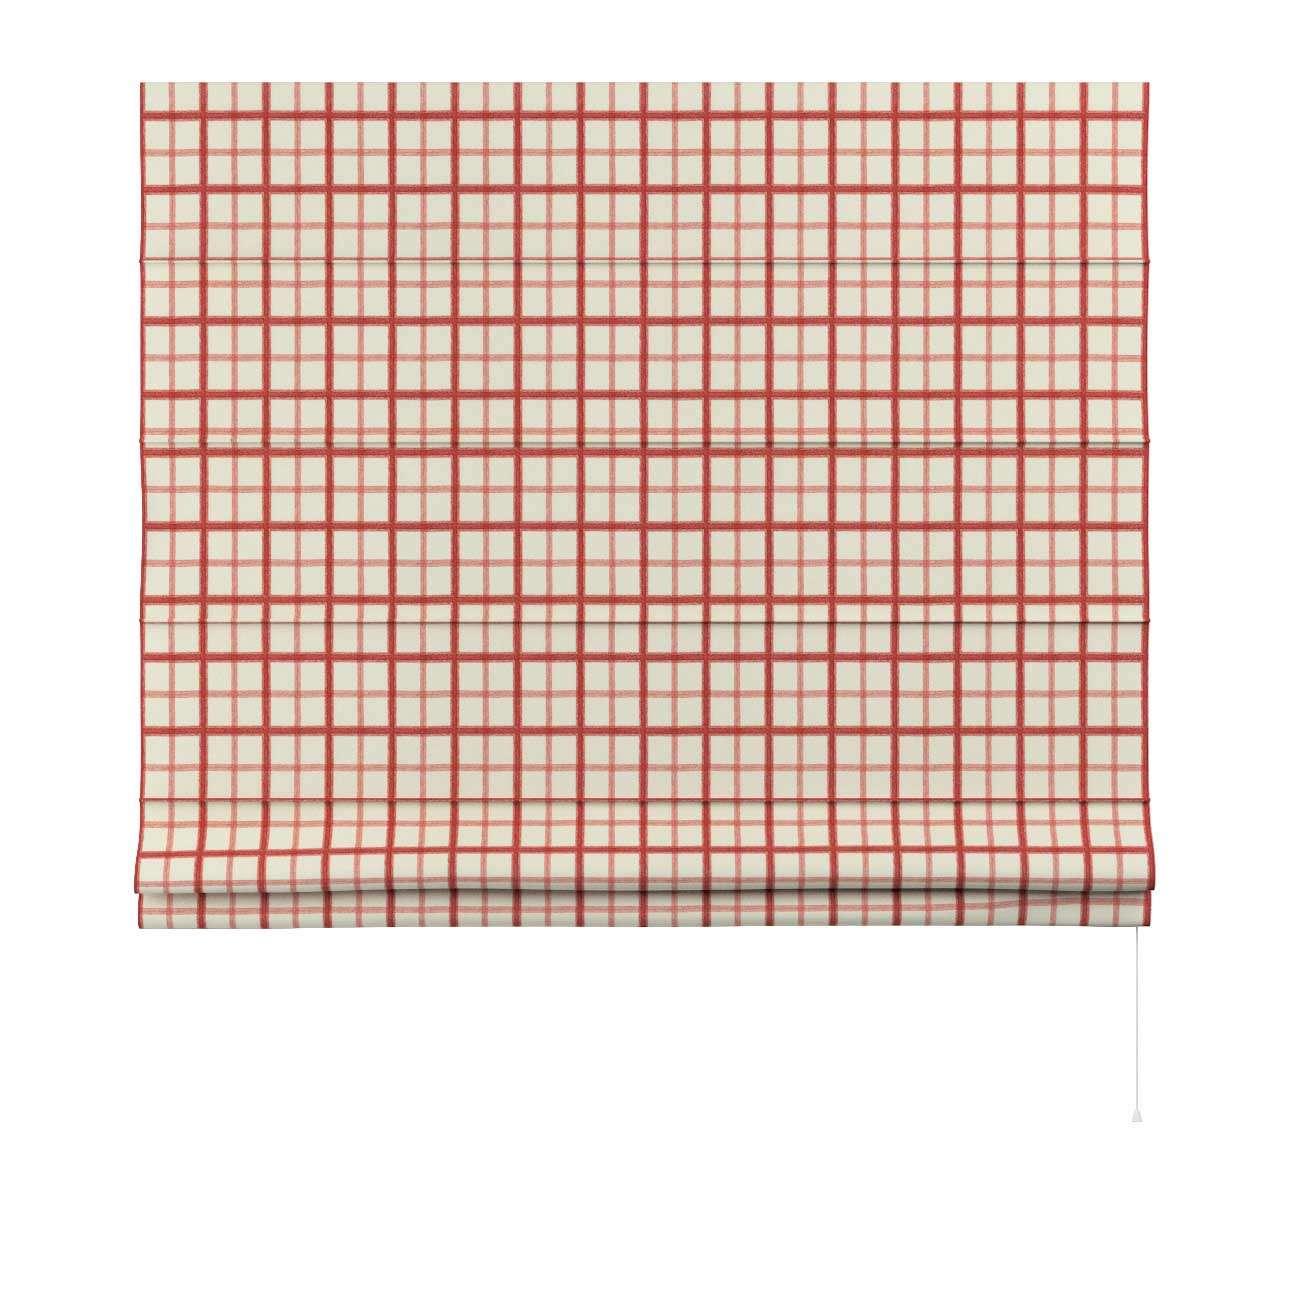 Capri roman blind 80 x 170 cm (31.5 x 67 inch) in collection Avinon, fabric: 131-15